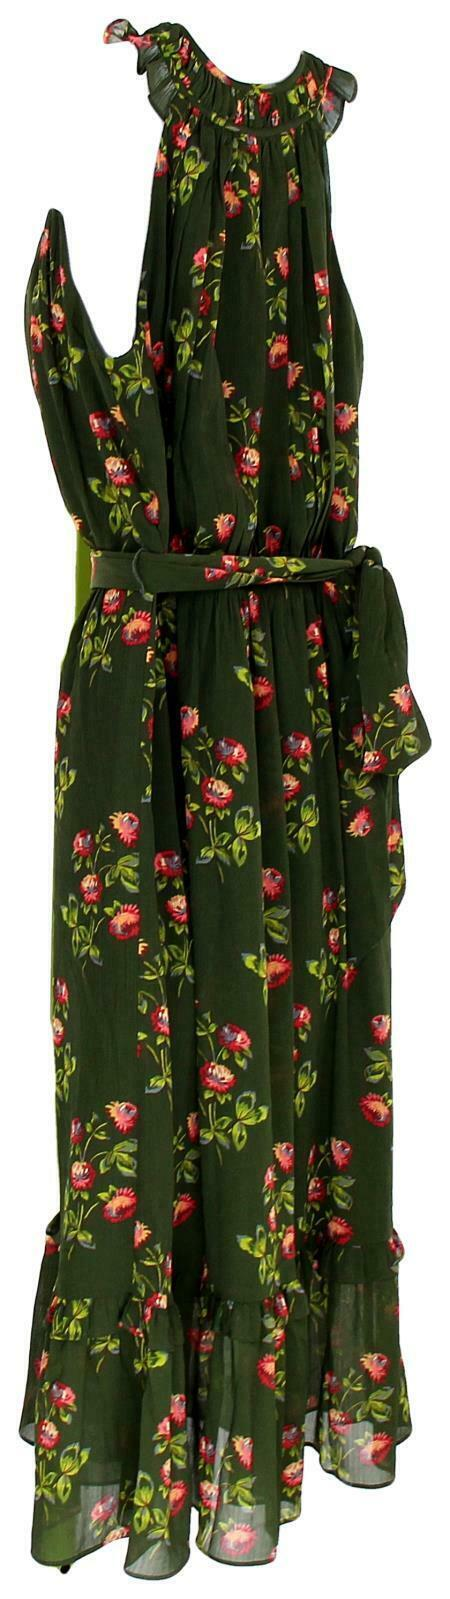 J Crew Women's Point Sur High-Neck Ruffle Floral Dress Chiffon 4 J5088 image 5